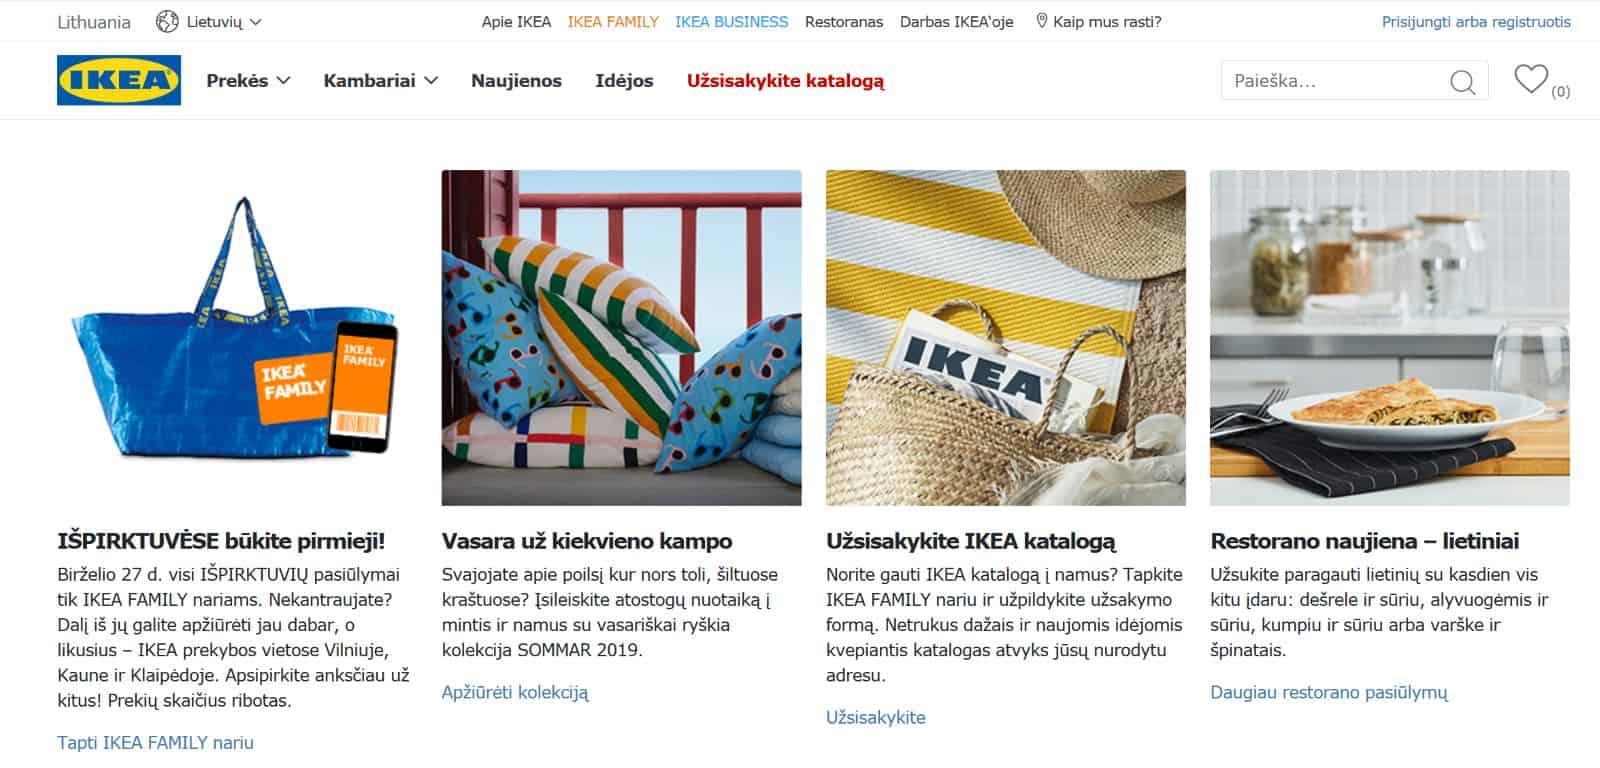 Kaip pirkti internetu iš IKEA.LT | IKEA – pirkimas internetu